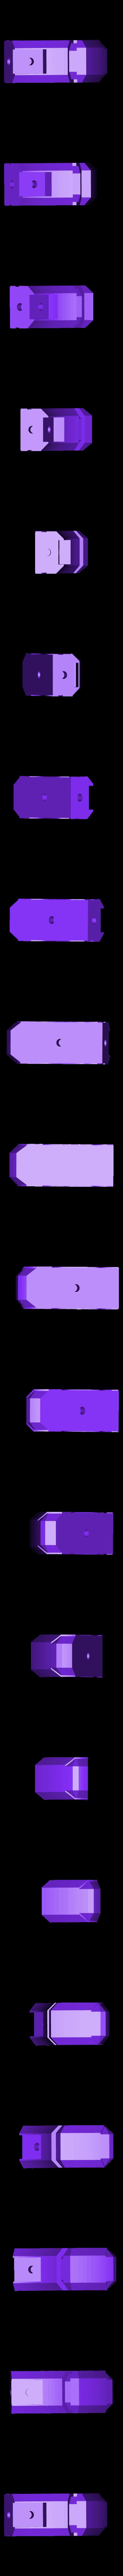 Bottom-TR.stl Download free STL file Full Sized Halo Plasma Pistol • 3D printer template, ChaosCoreTech